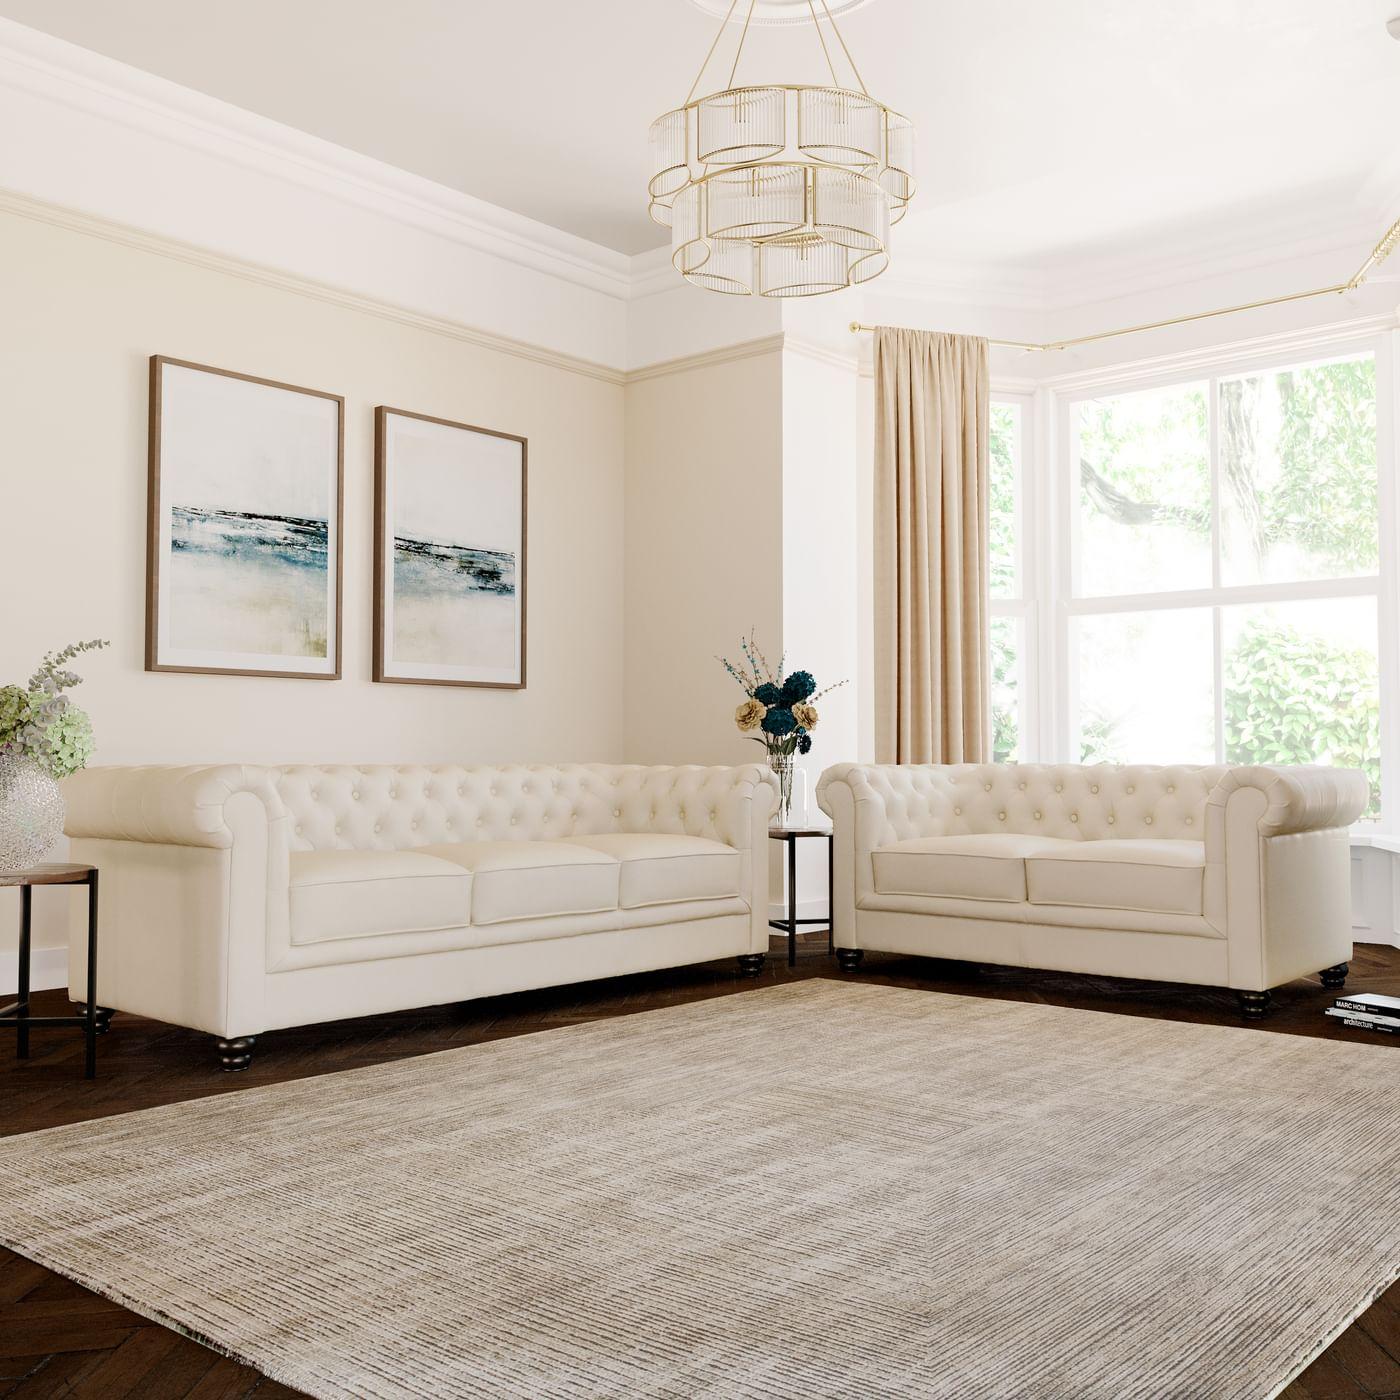 Merveilleux Gallery. Hampton Leather Chesterfield Sofa ...